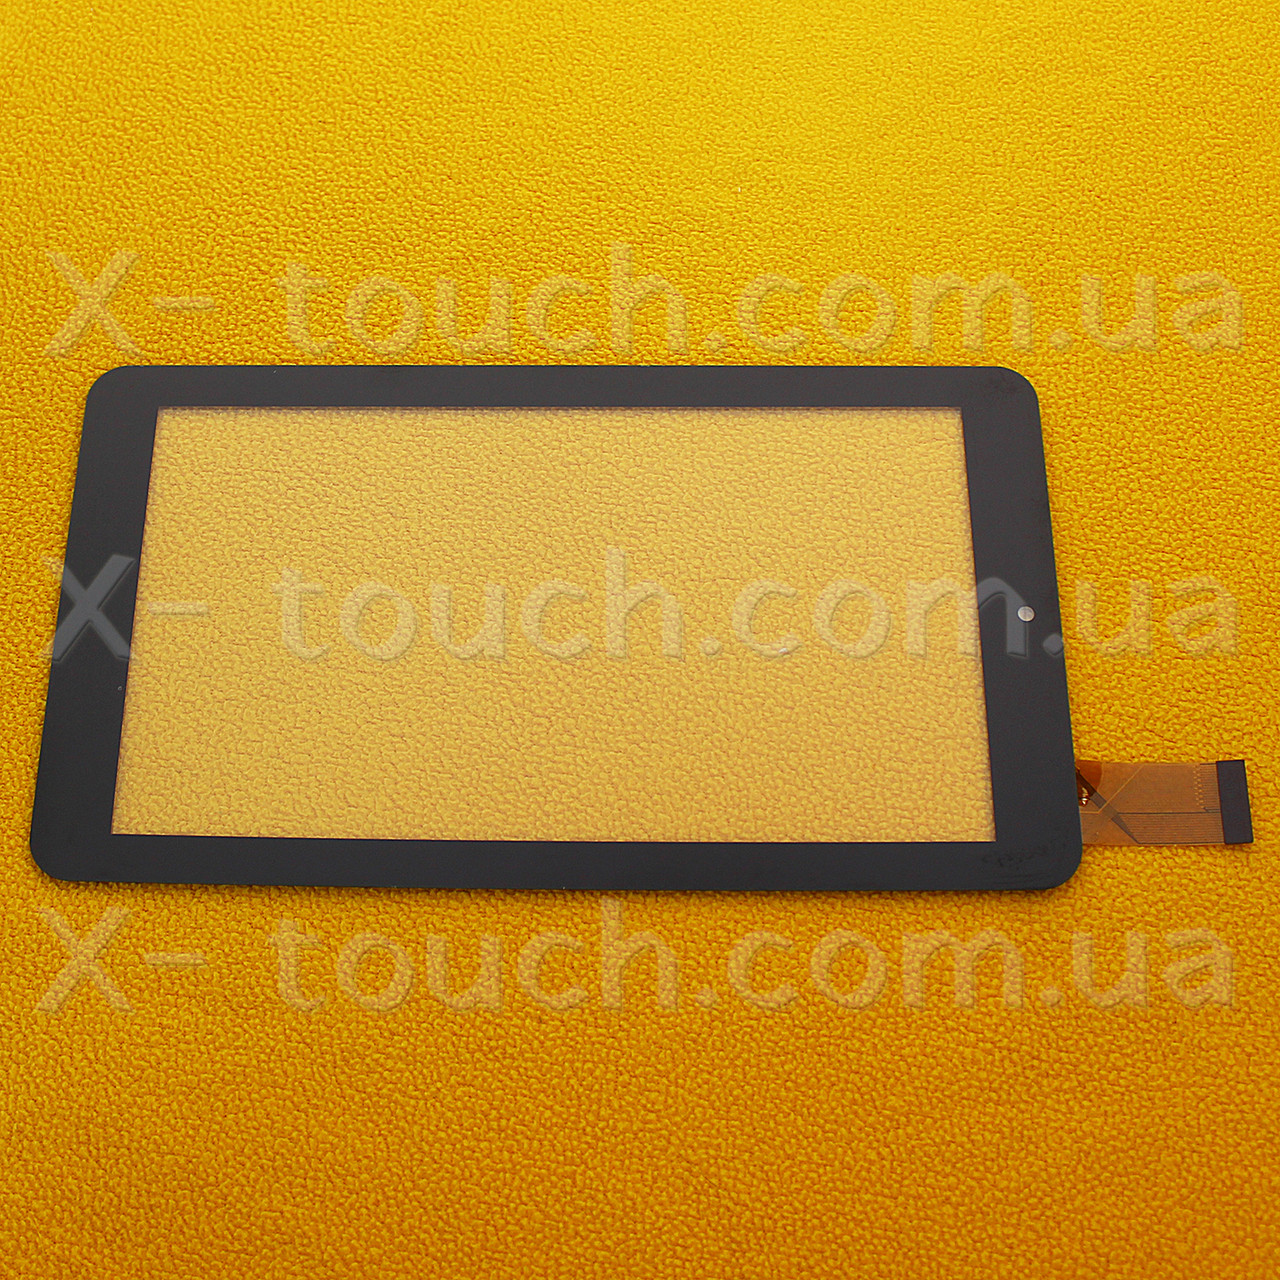 Тачскрин, сенсор  Pg0700-037  для планшета